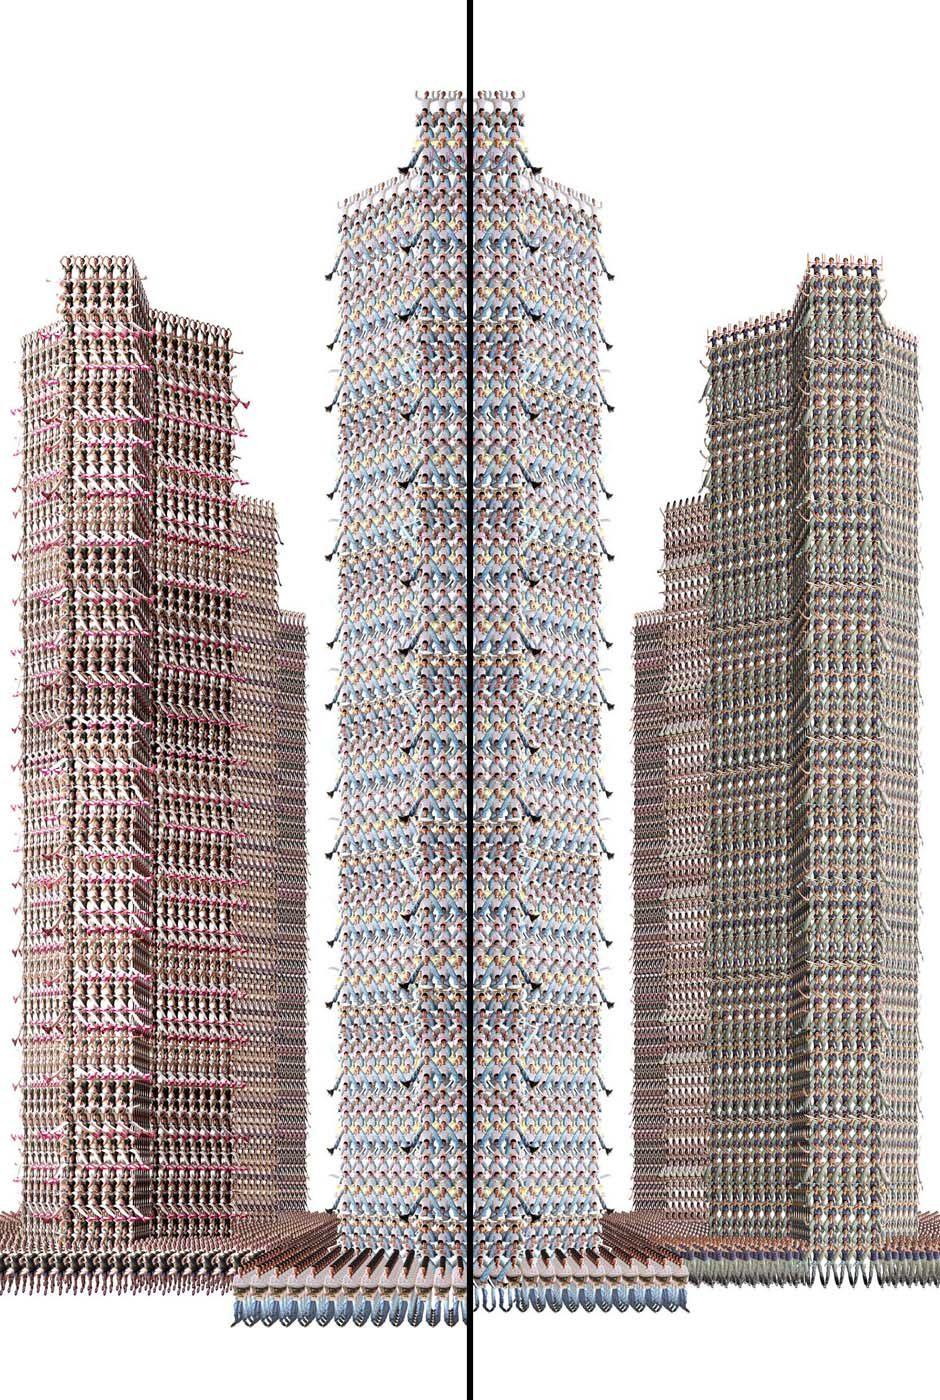 12 MOTULORS DEN-CITY TOWERS.jpg